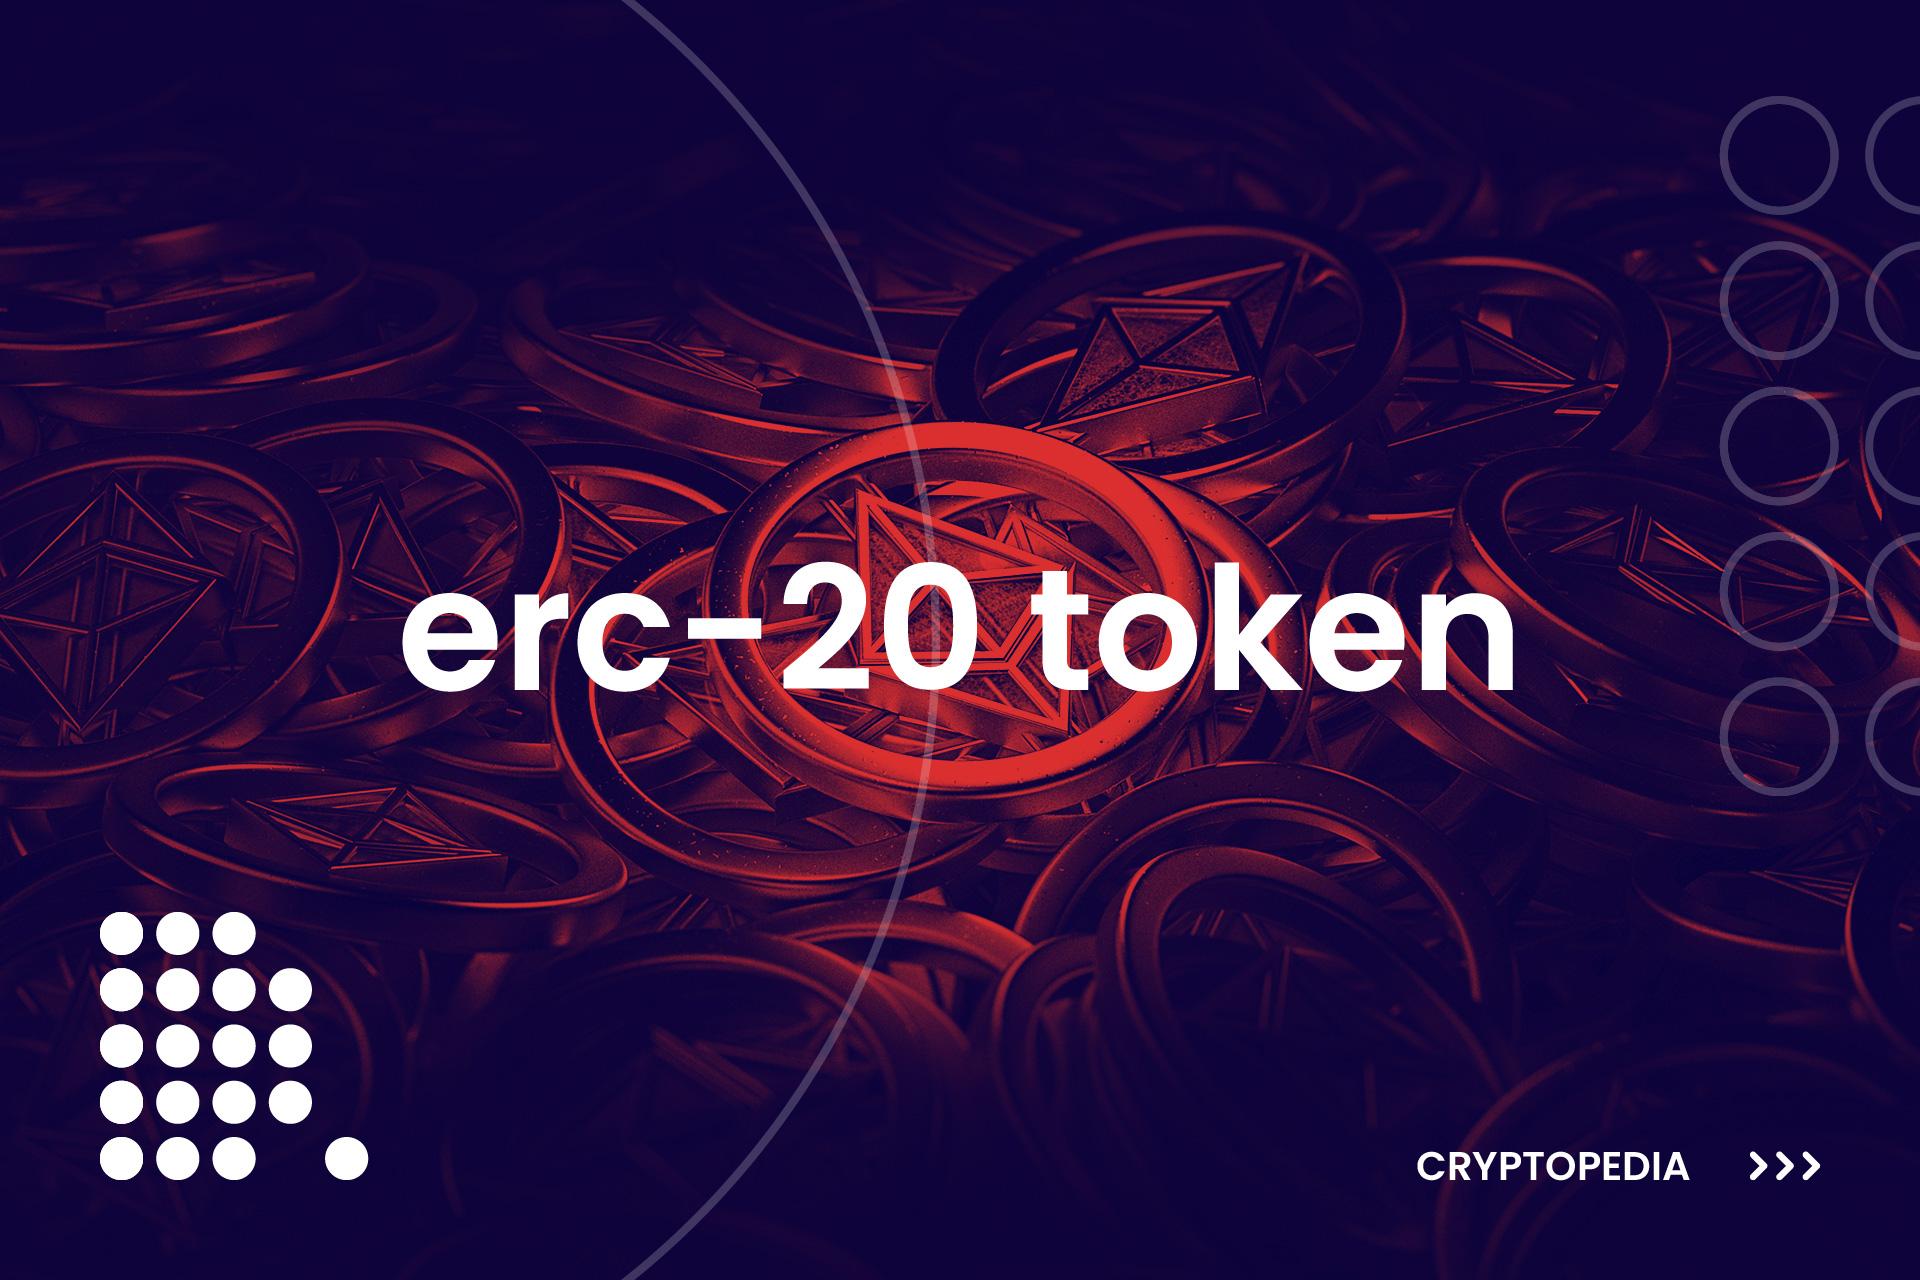 What is erc-20 token?